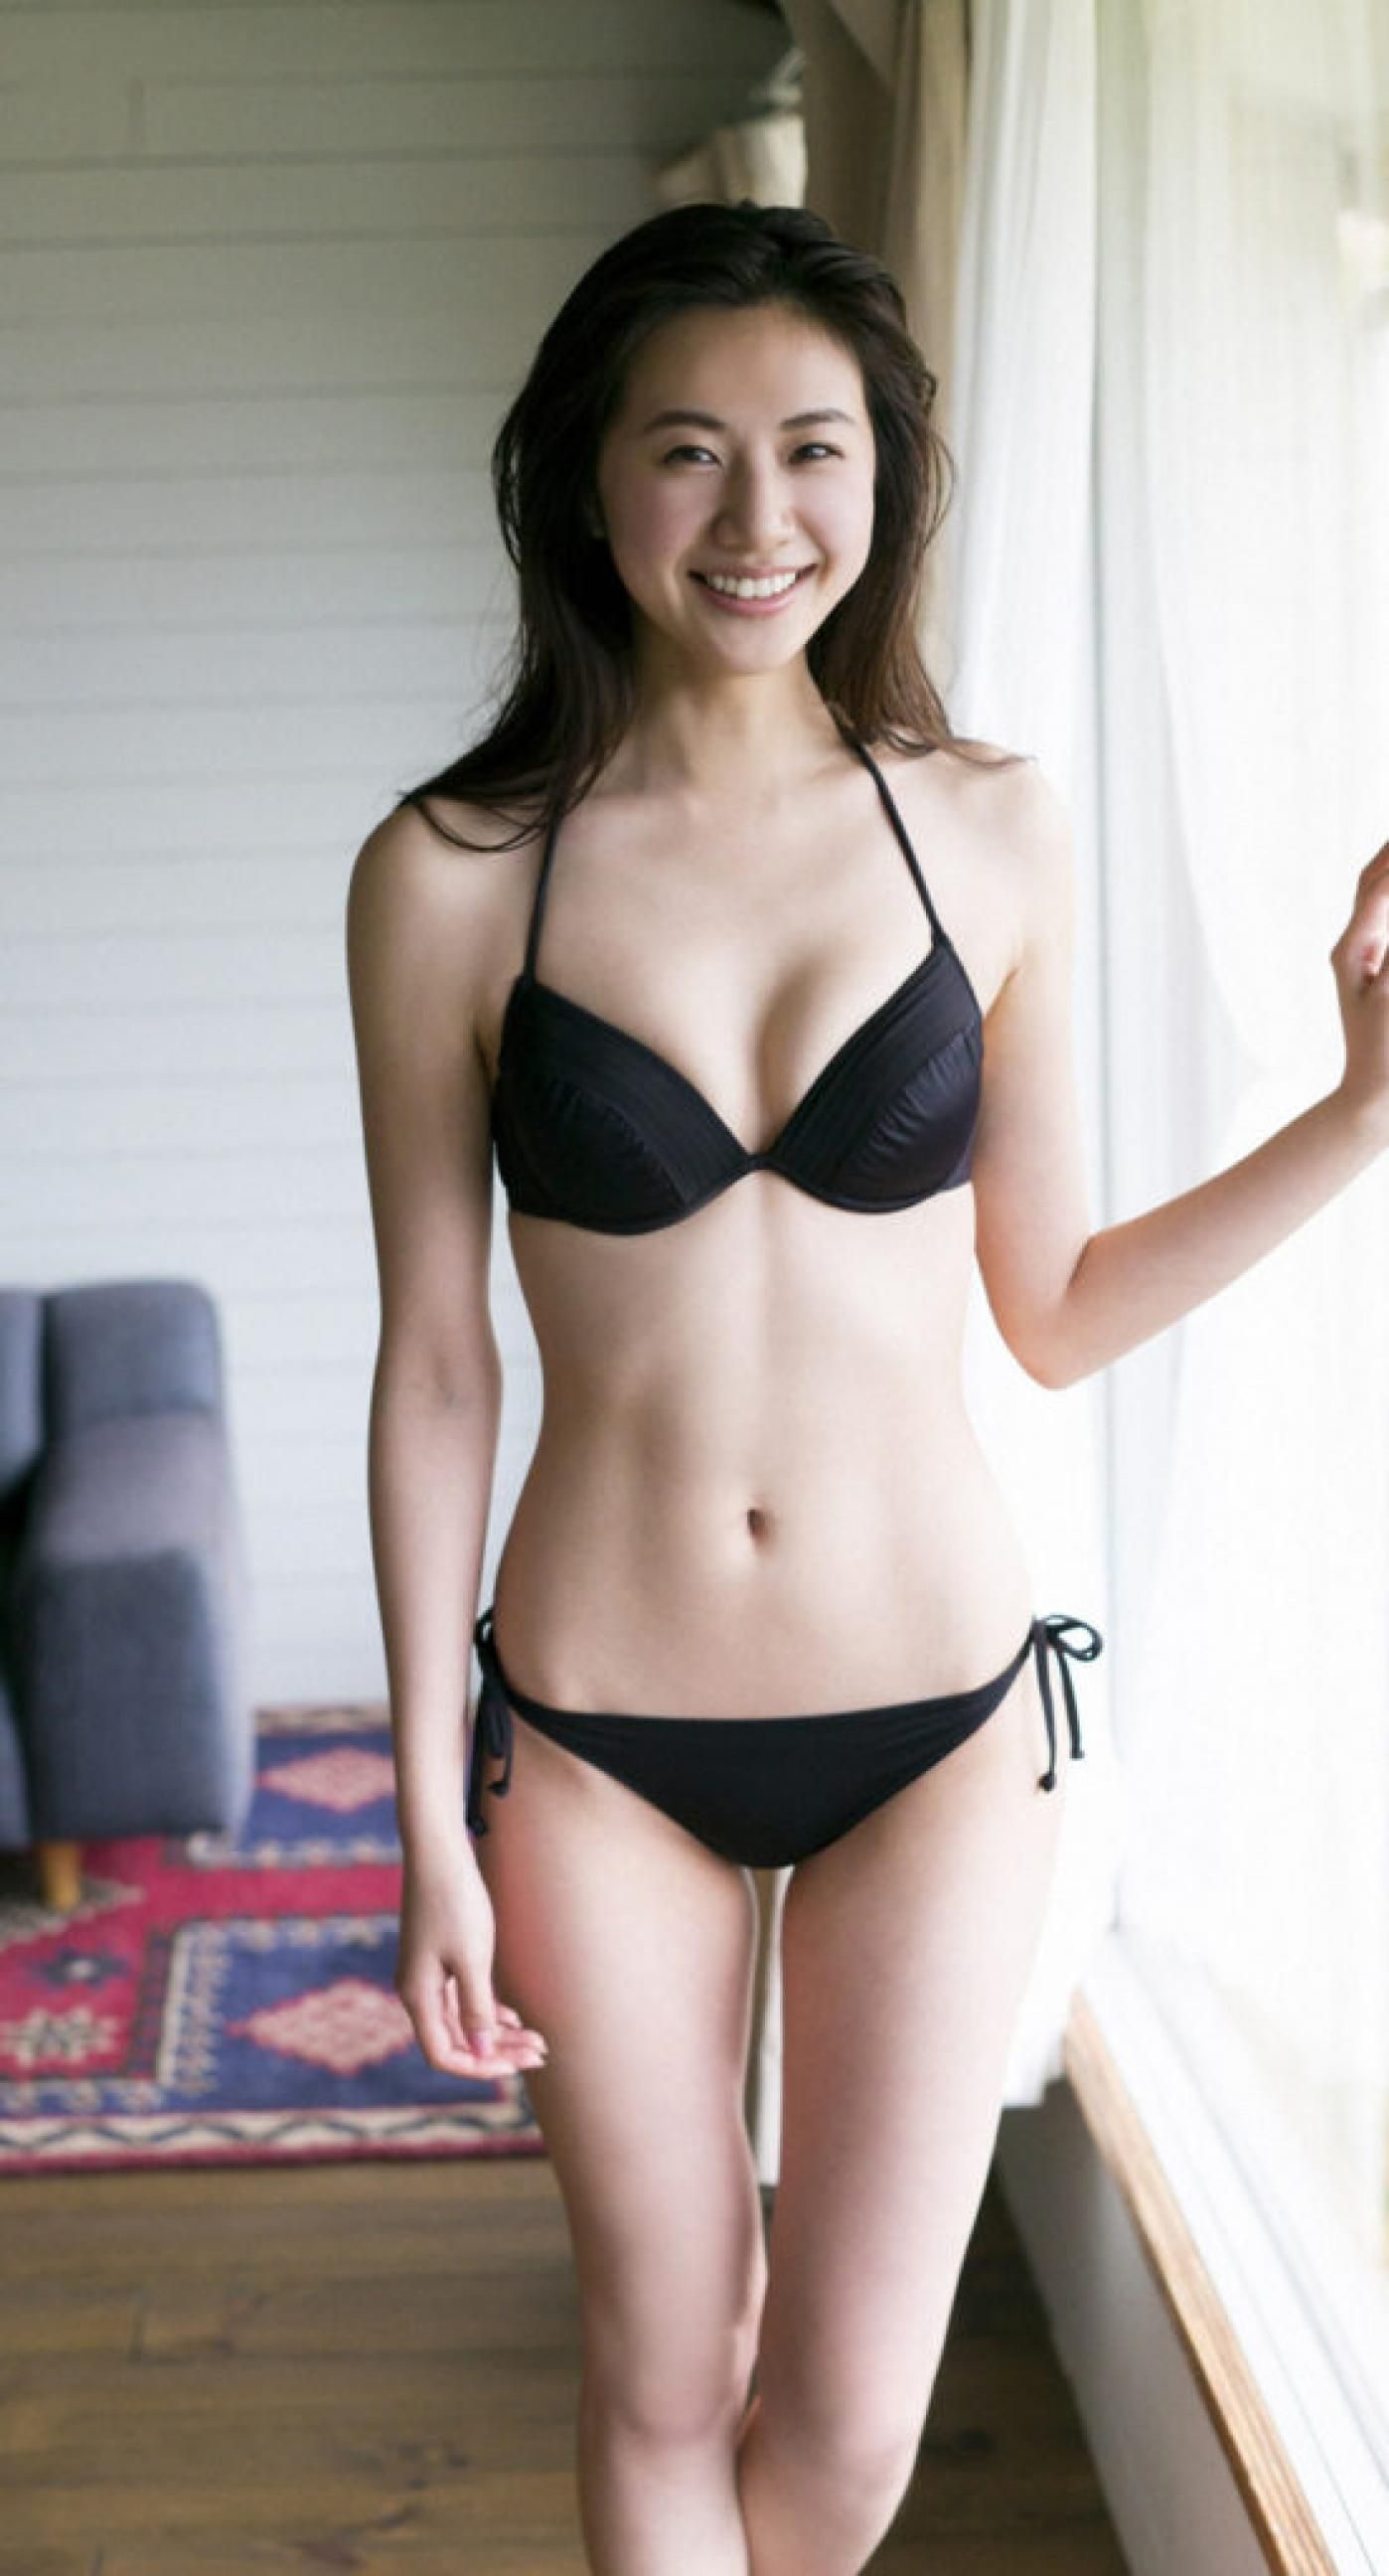 model cherish nudeams 11young nude pics selfie